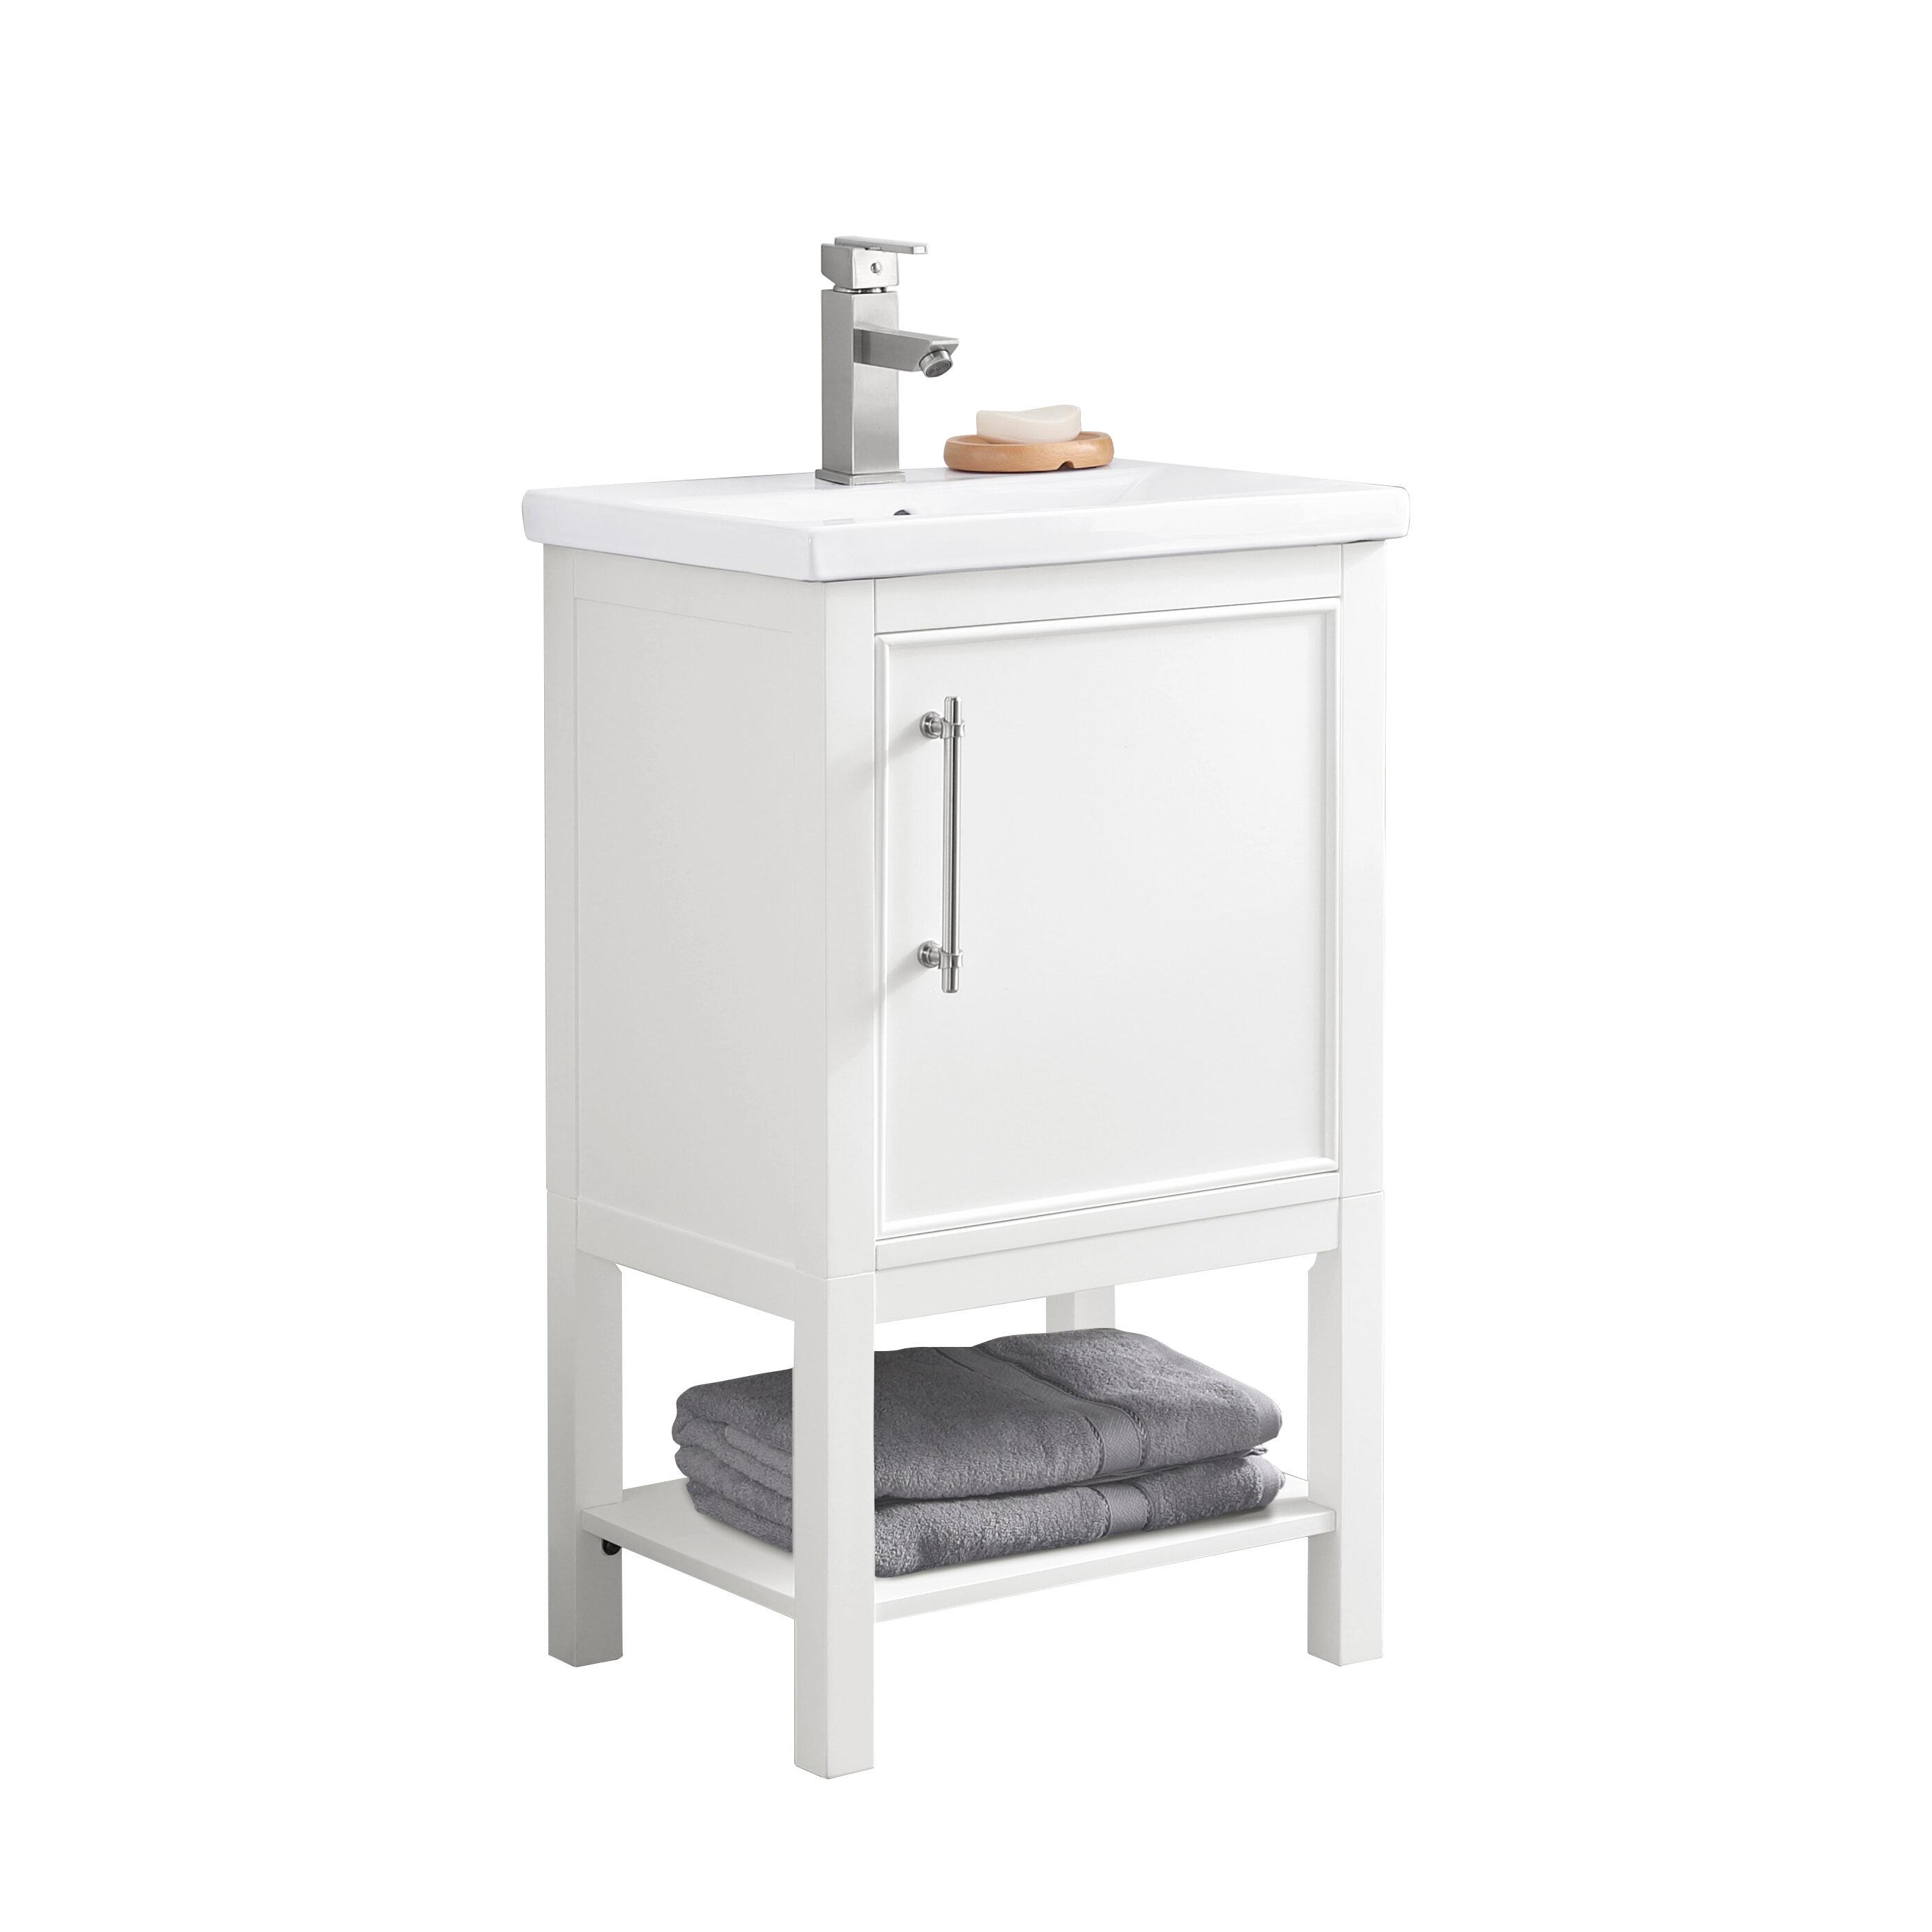 Briaca 20 Single Bathroom Vanity